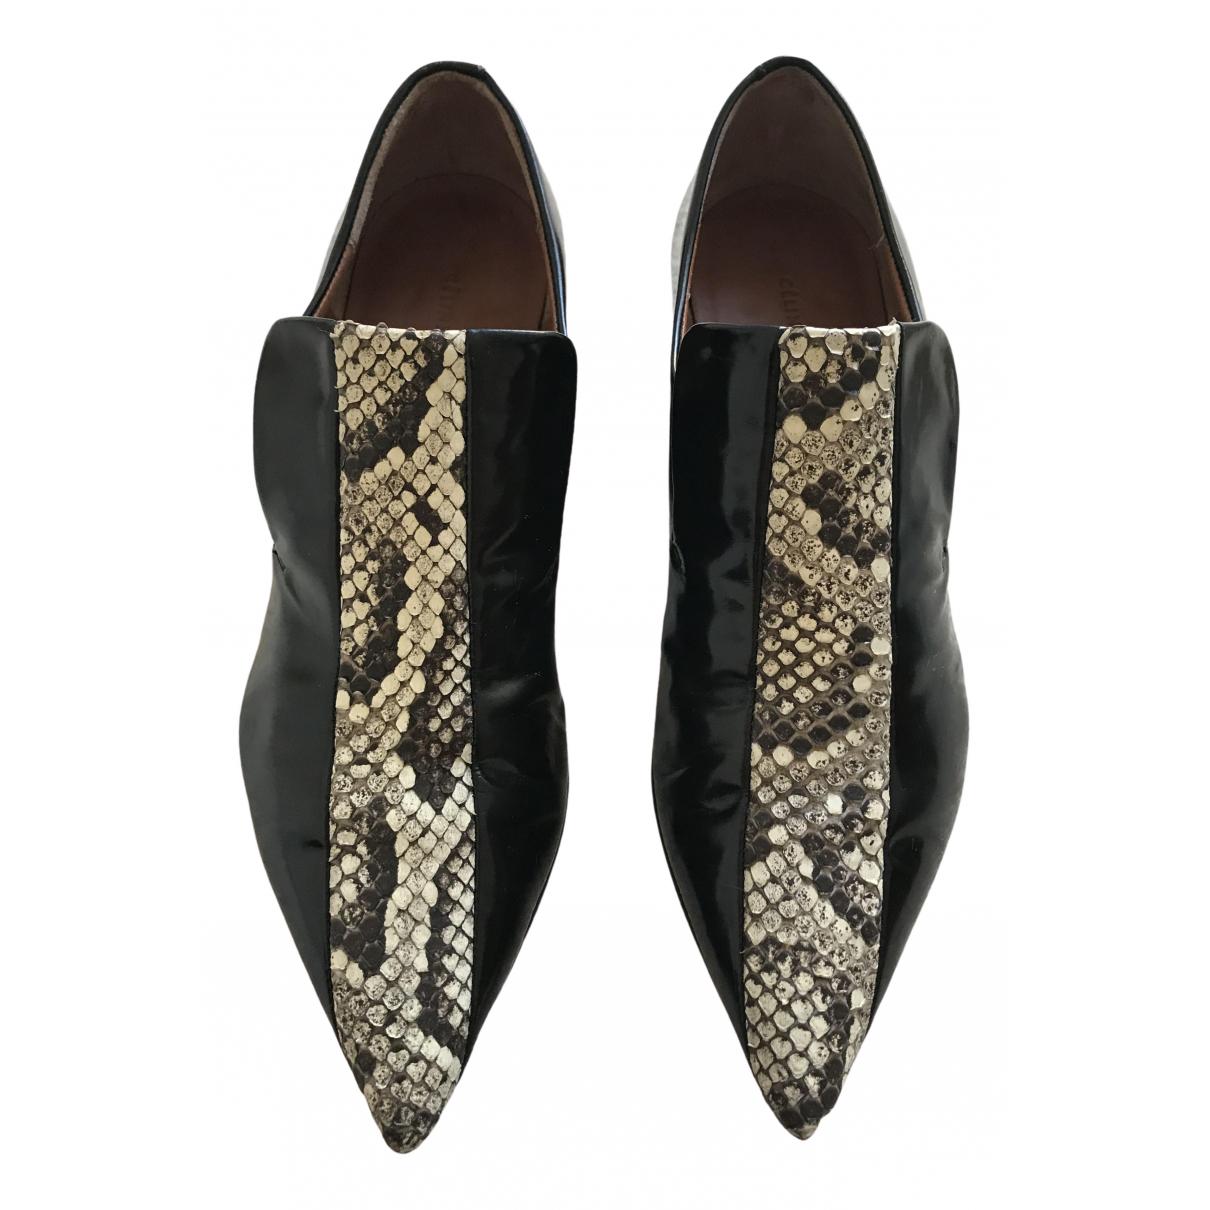 Celine \N Black Leather Flats for Women 38 EU